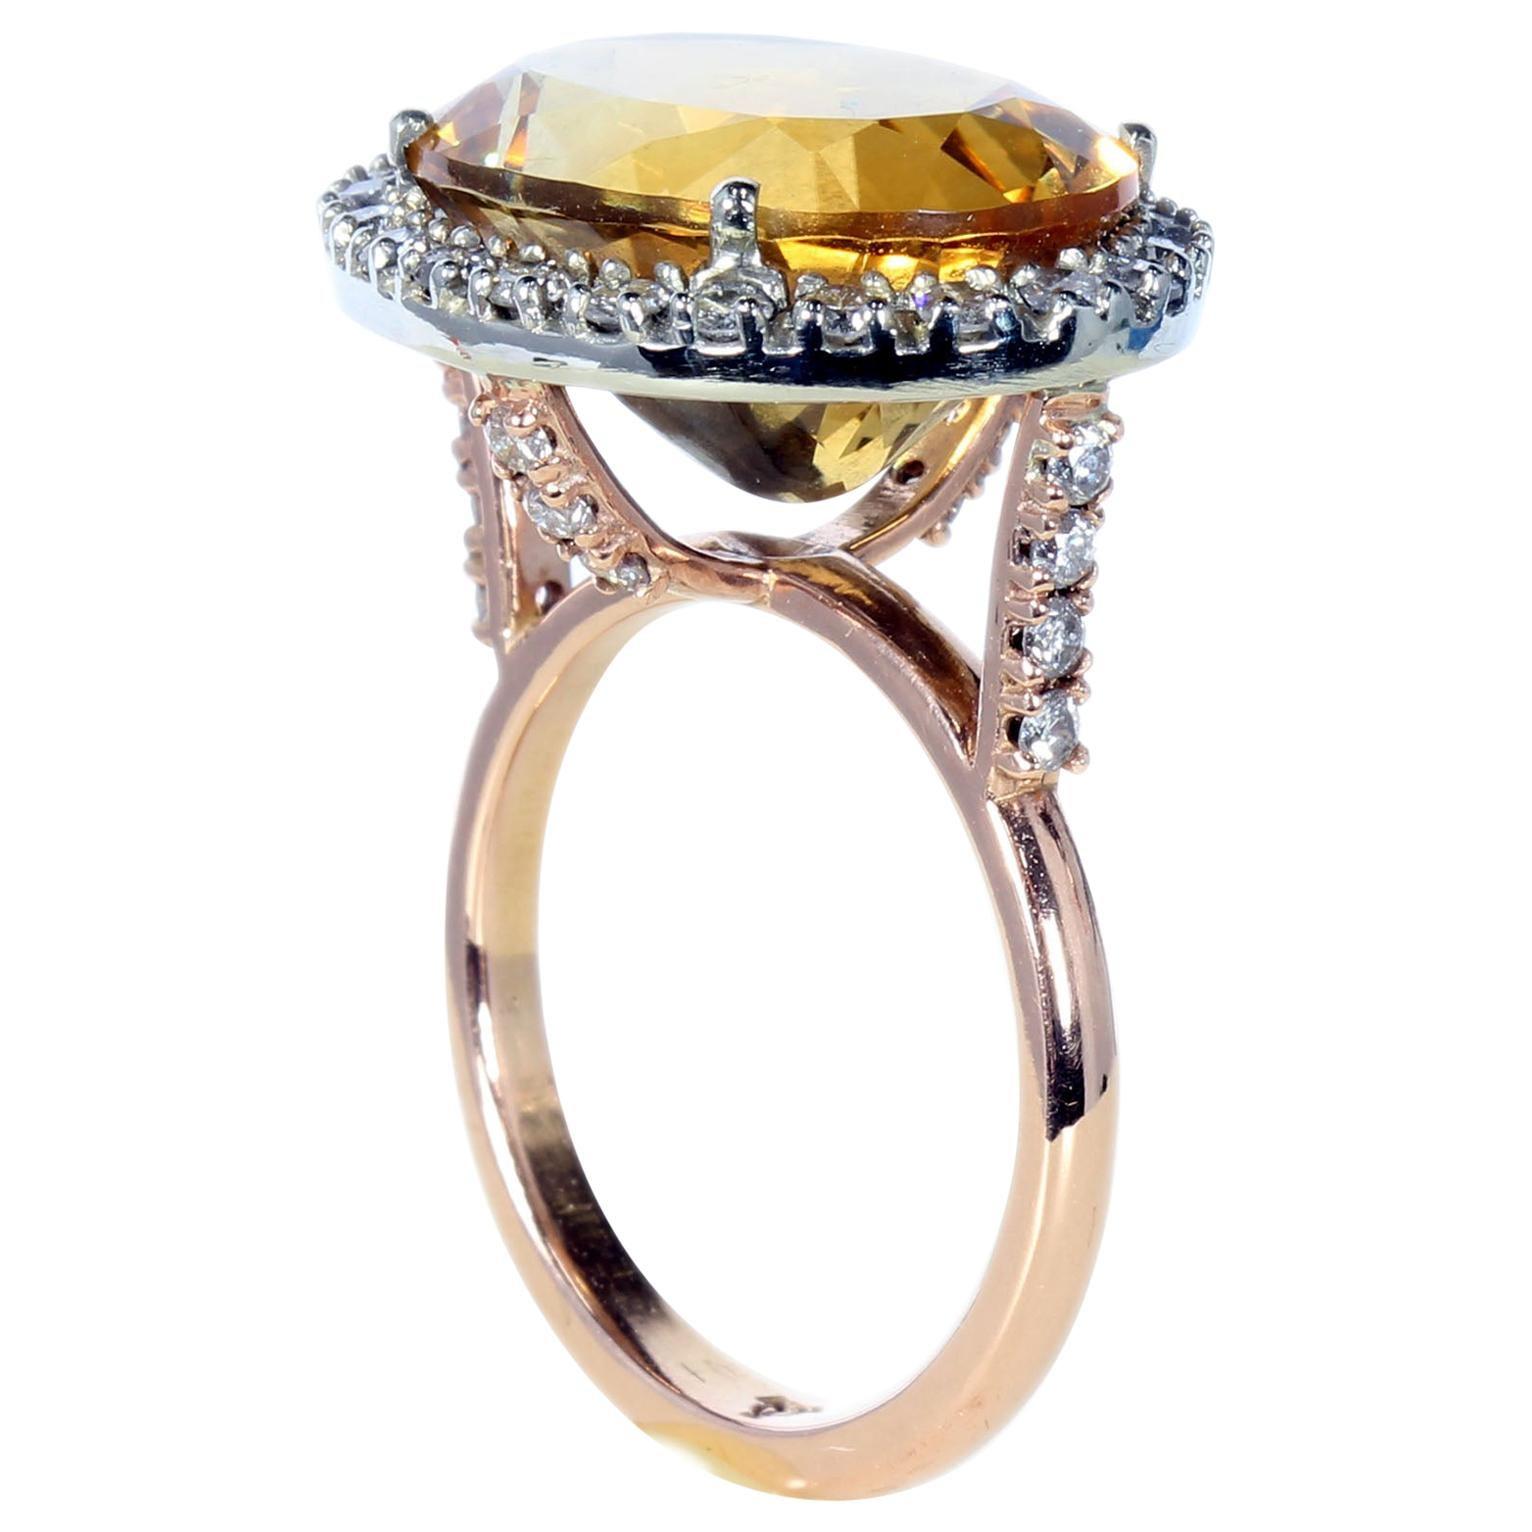 18 Karat Red Gold Imperial Topaz Diamonds Designer Cocktail Ring